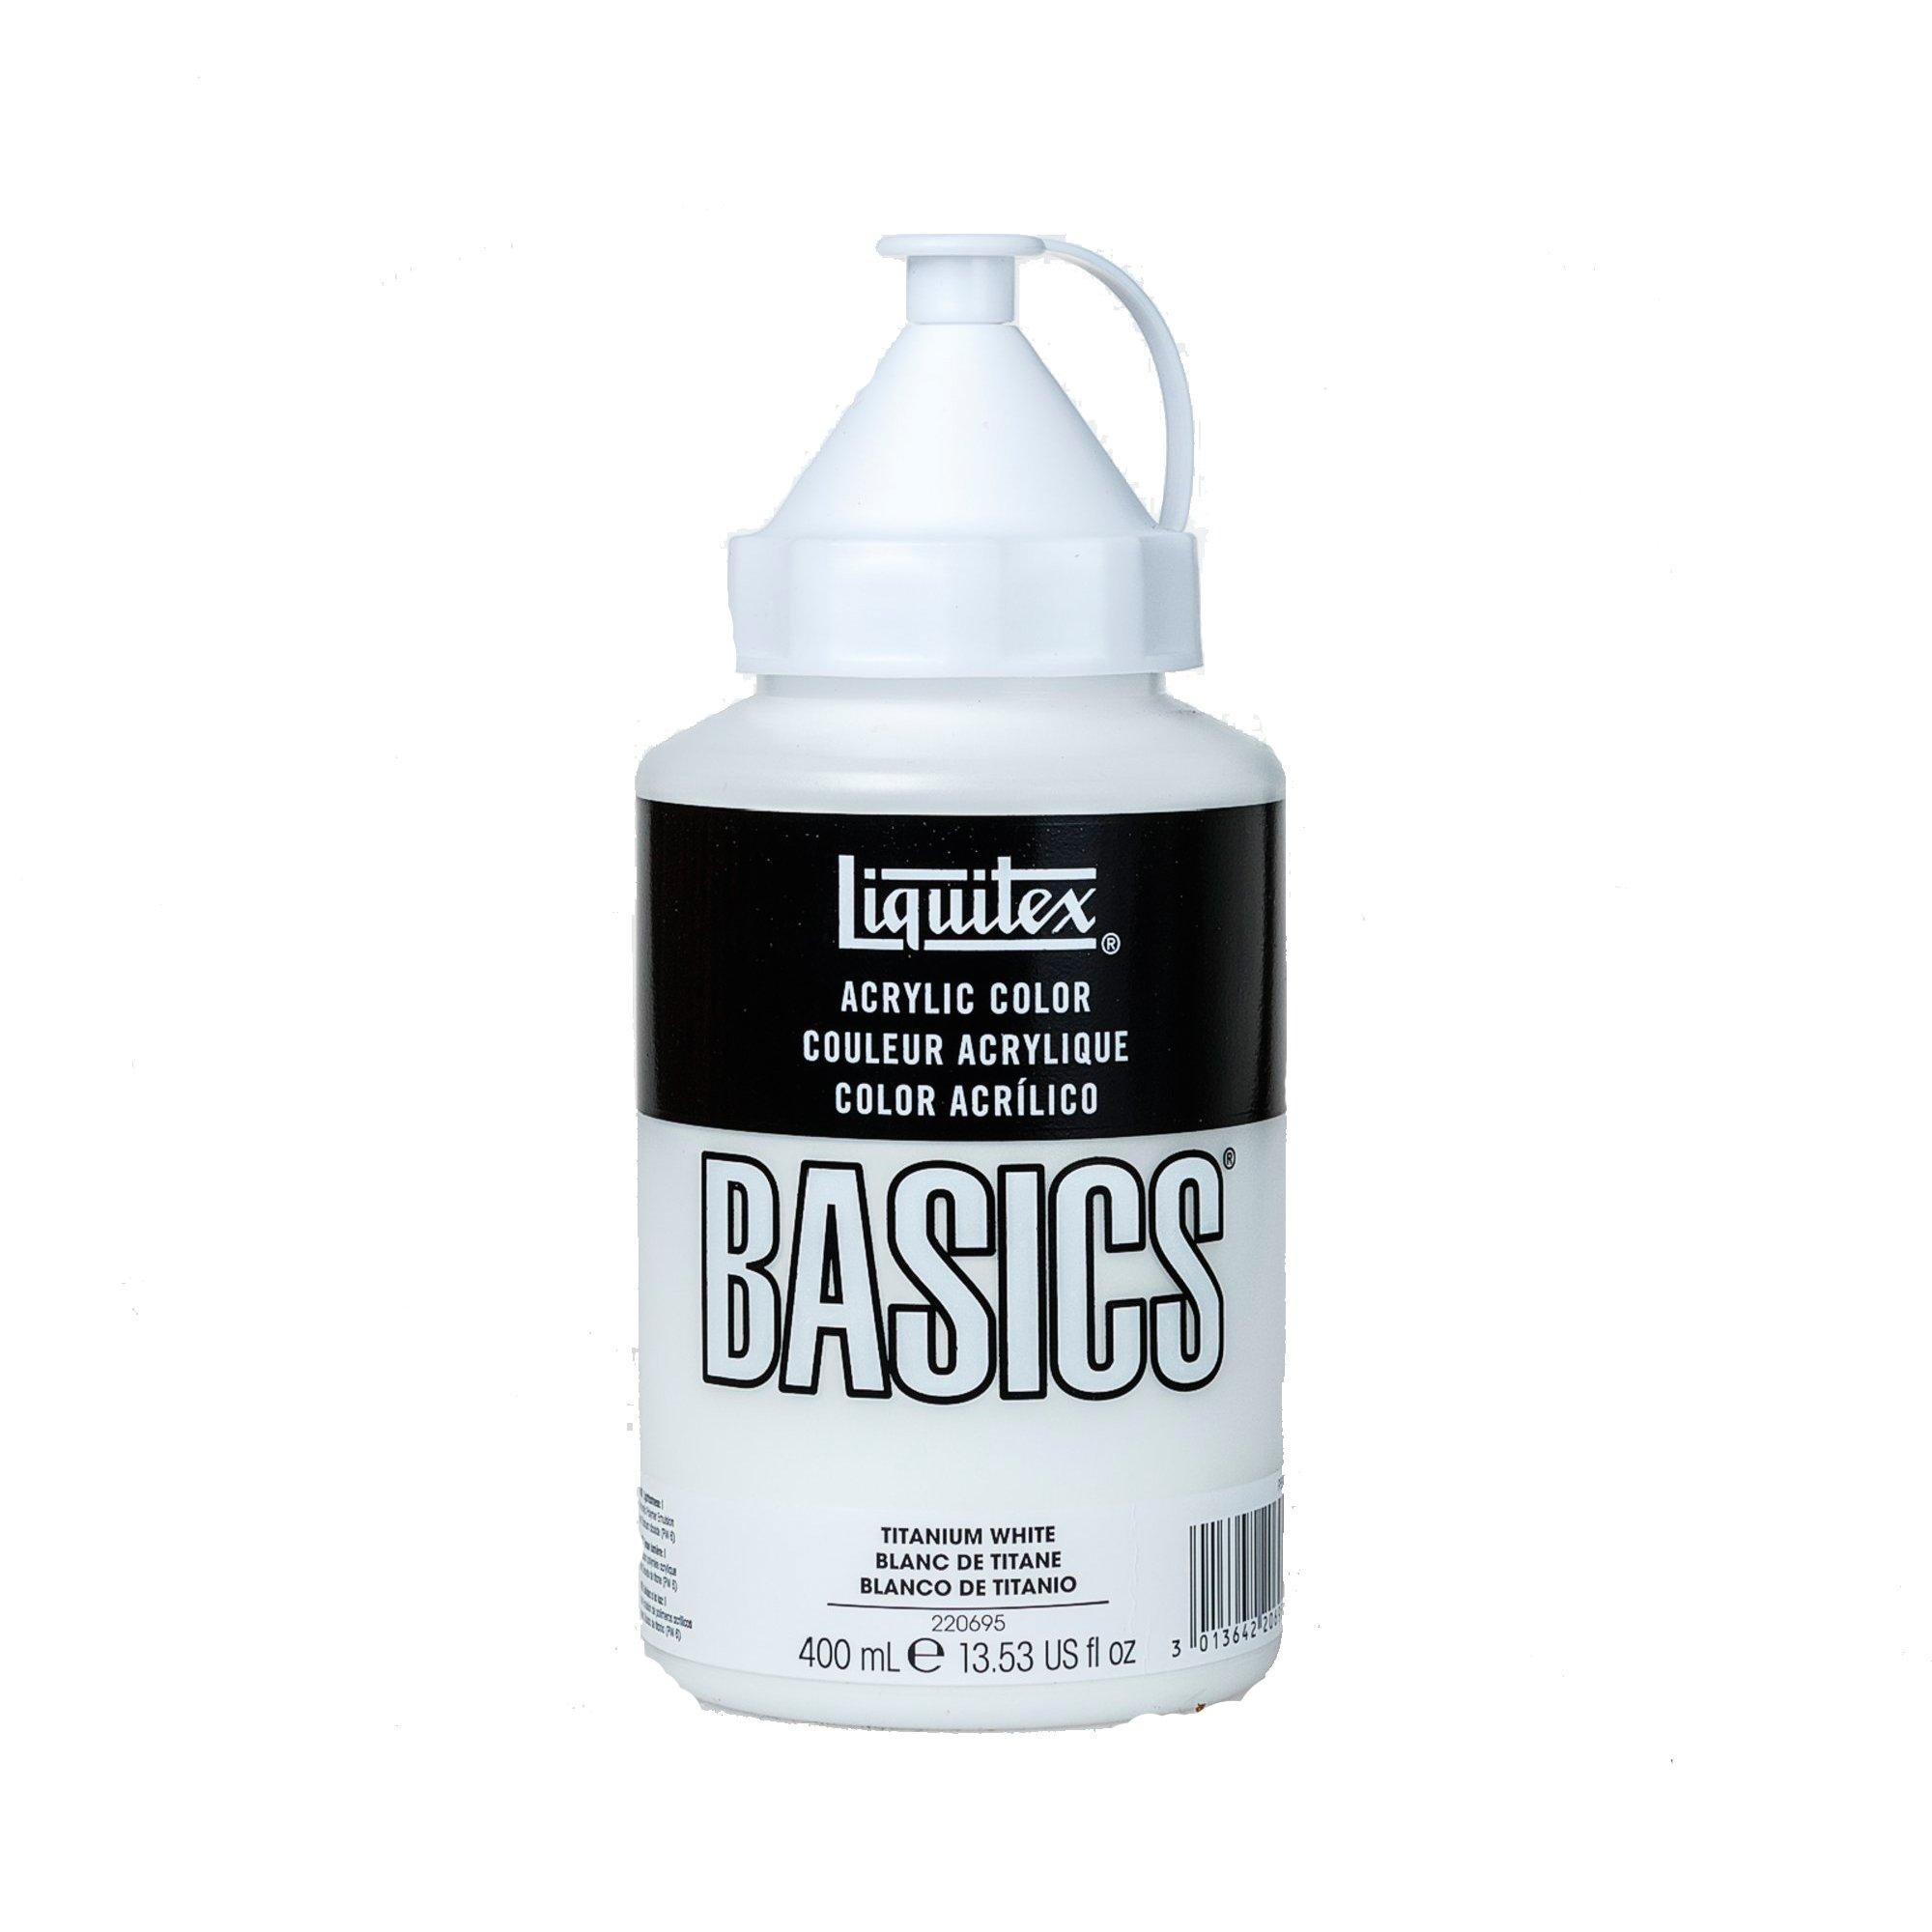 Liquitex BASICS Acrylic Paint, 13.5oz Squeeze Bottle, Titanium White